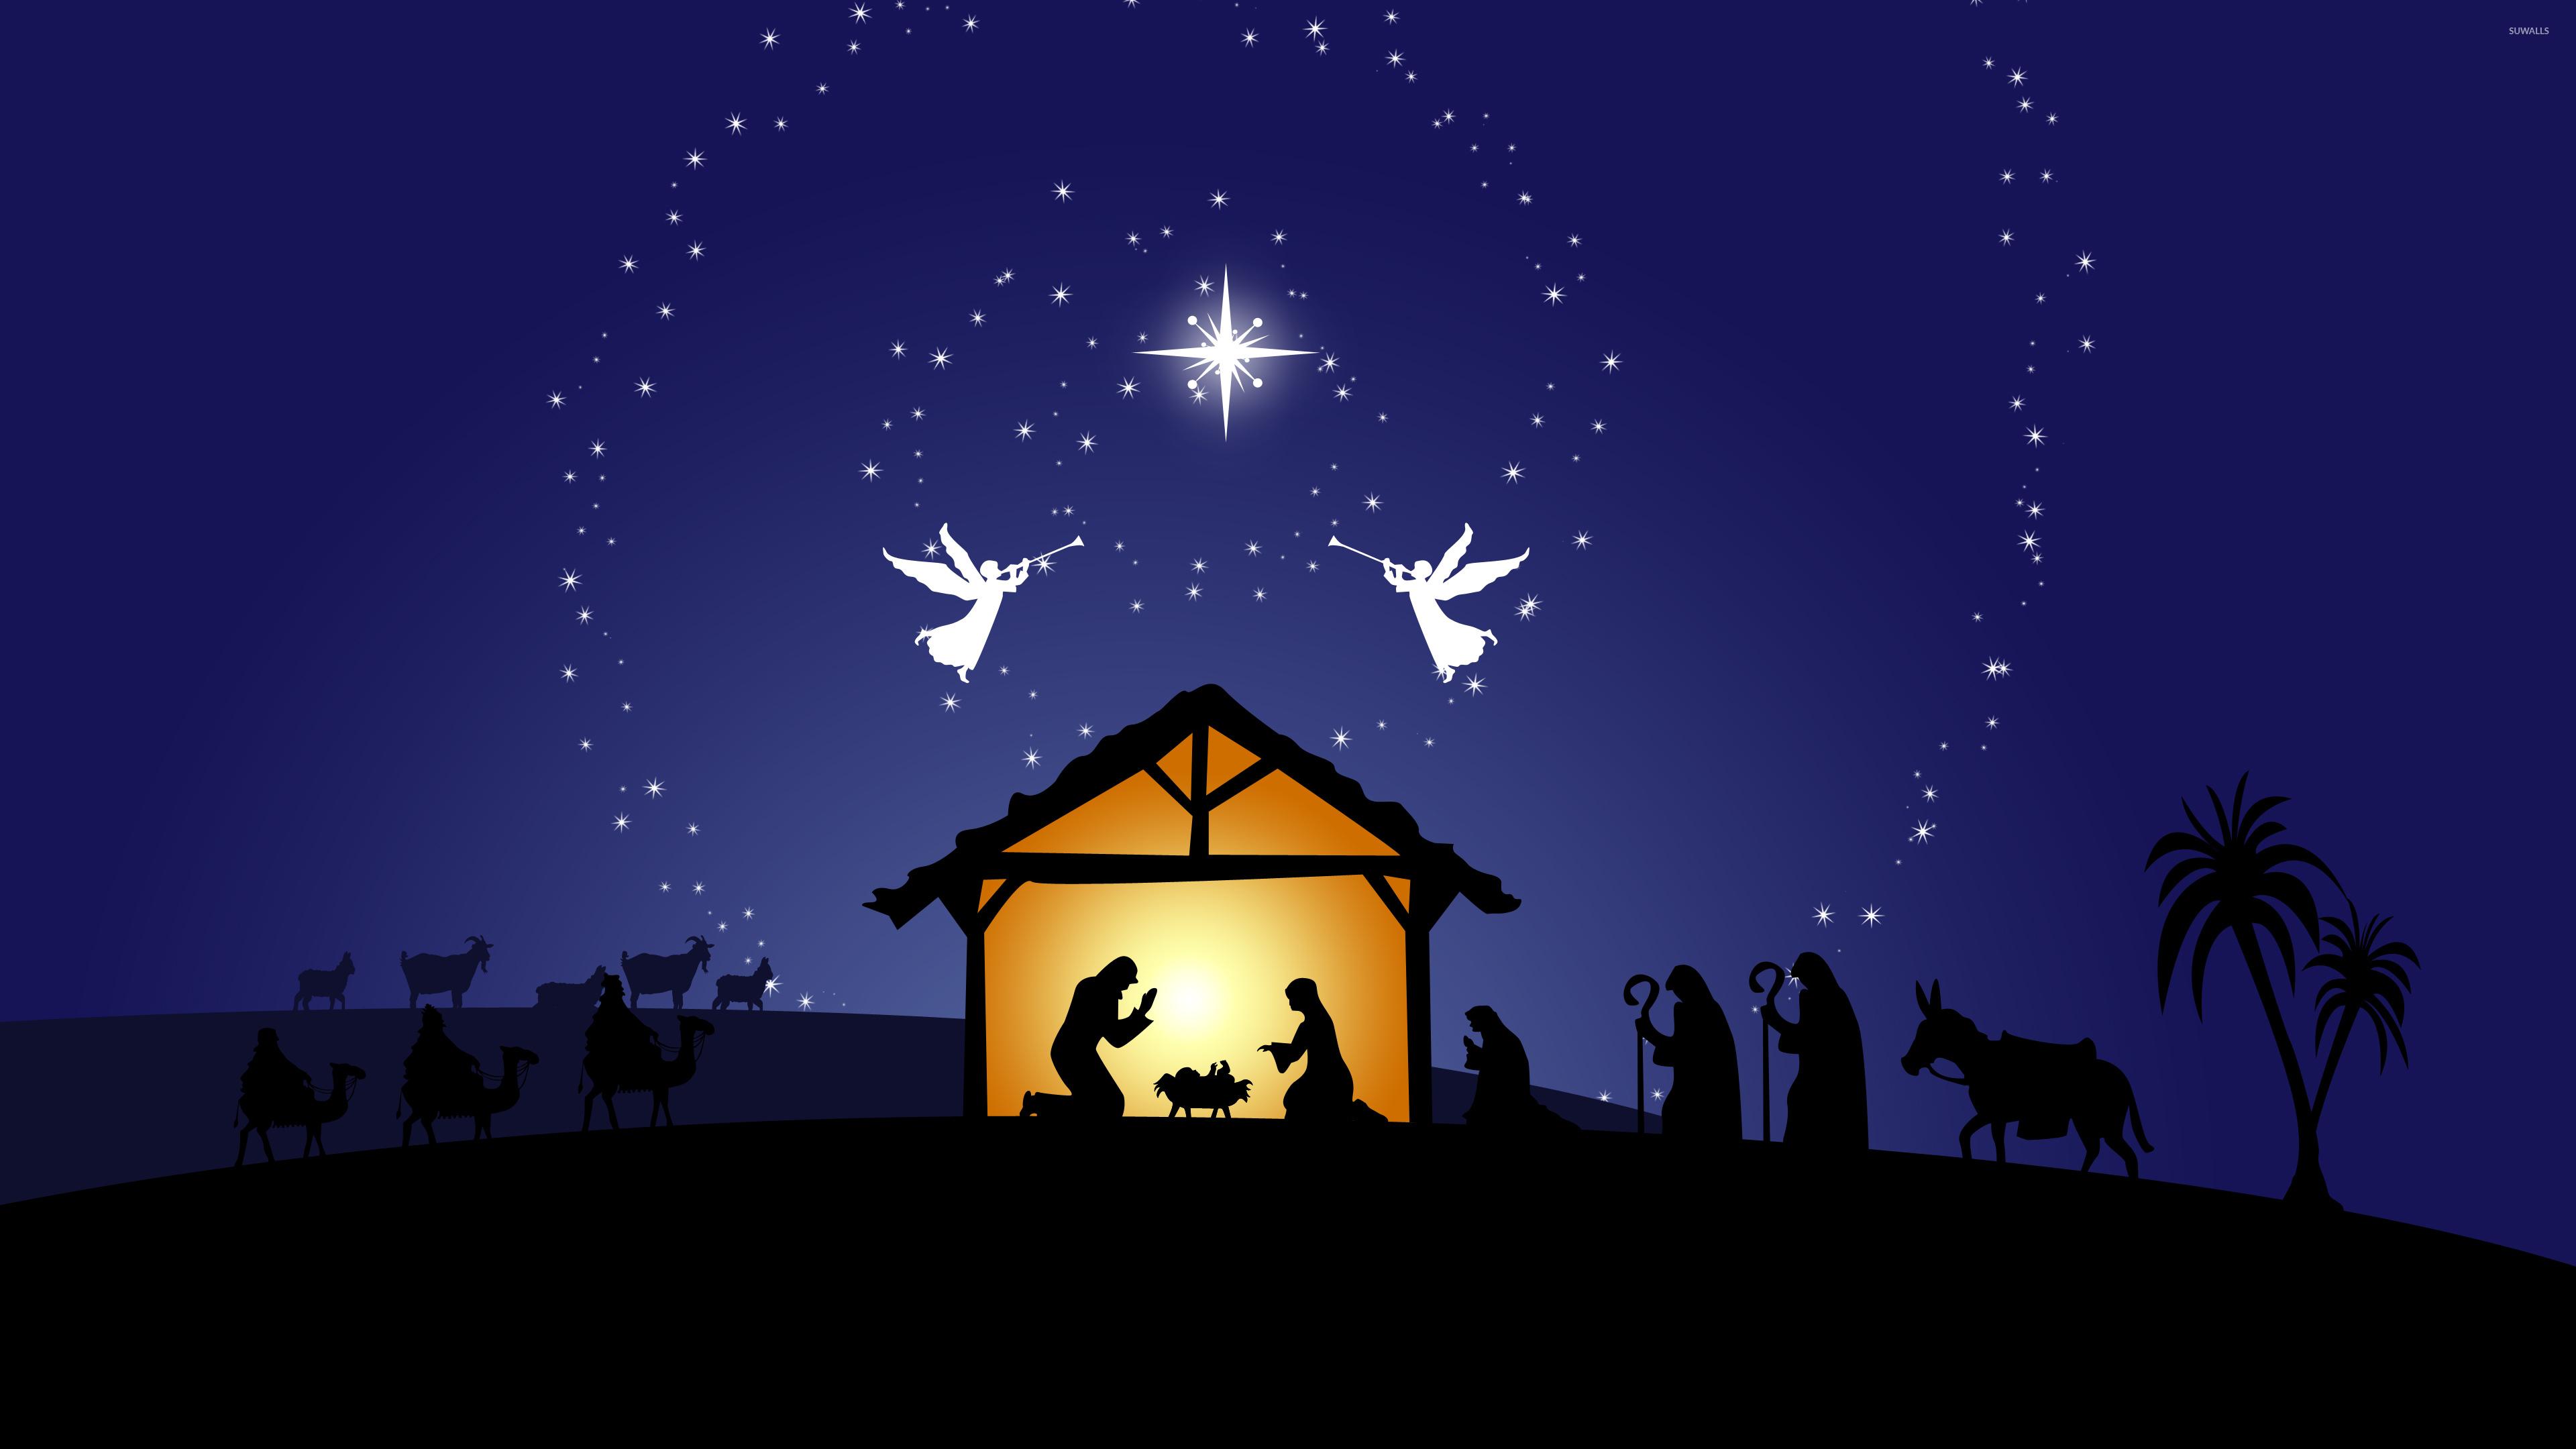 nativity-scene-50278-3840x2160